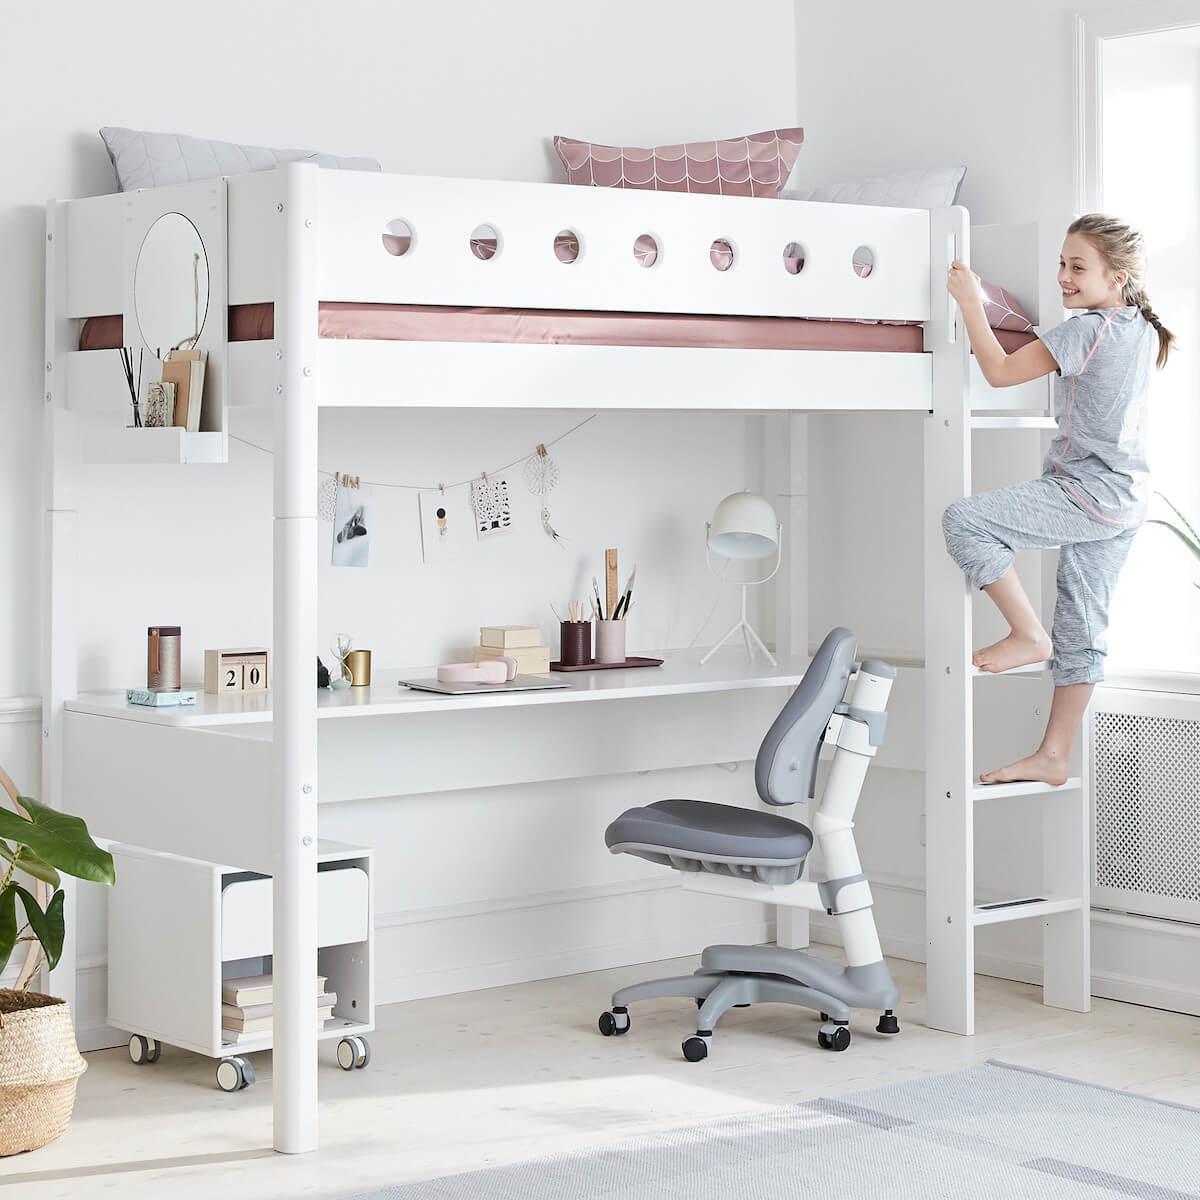 Silla de oficina infantil 7-12Y STUDY NOVO Flexa gris claro